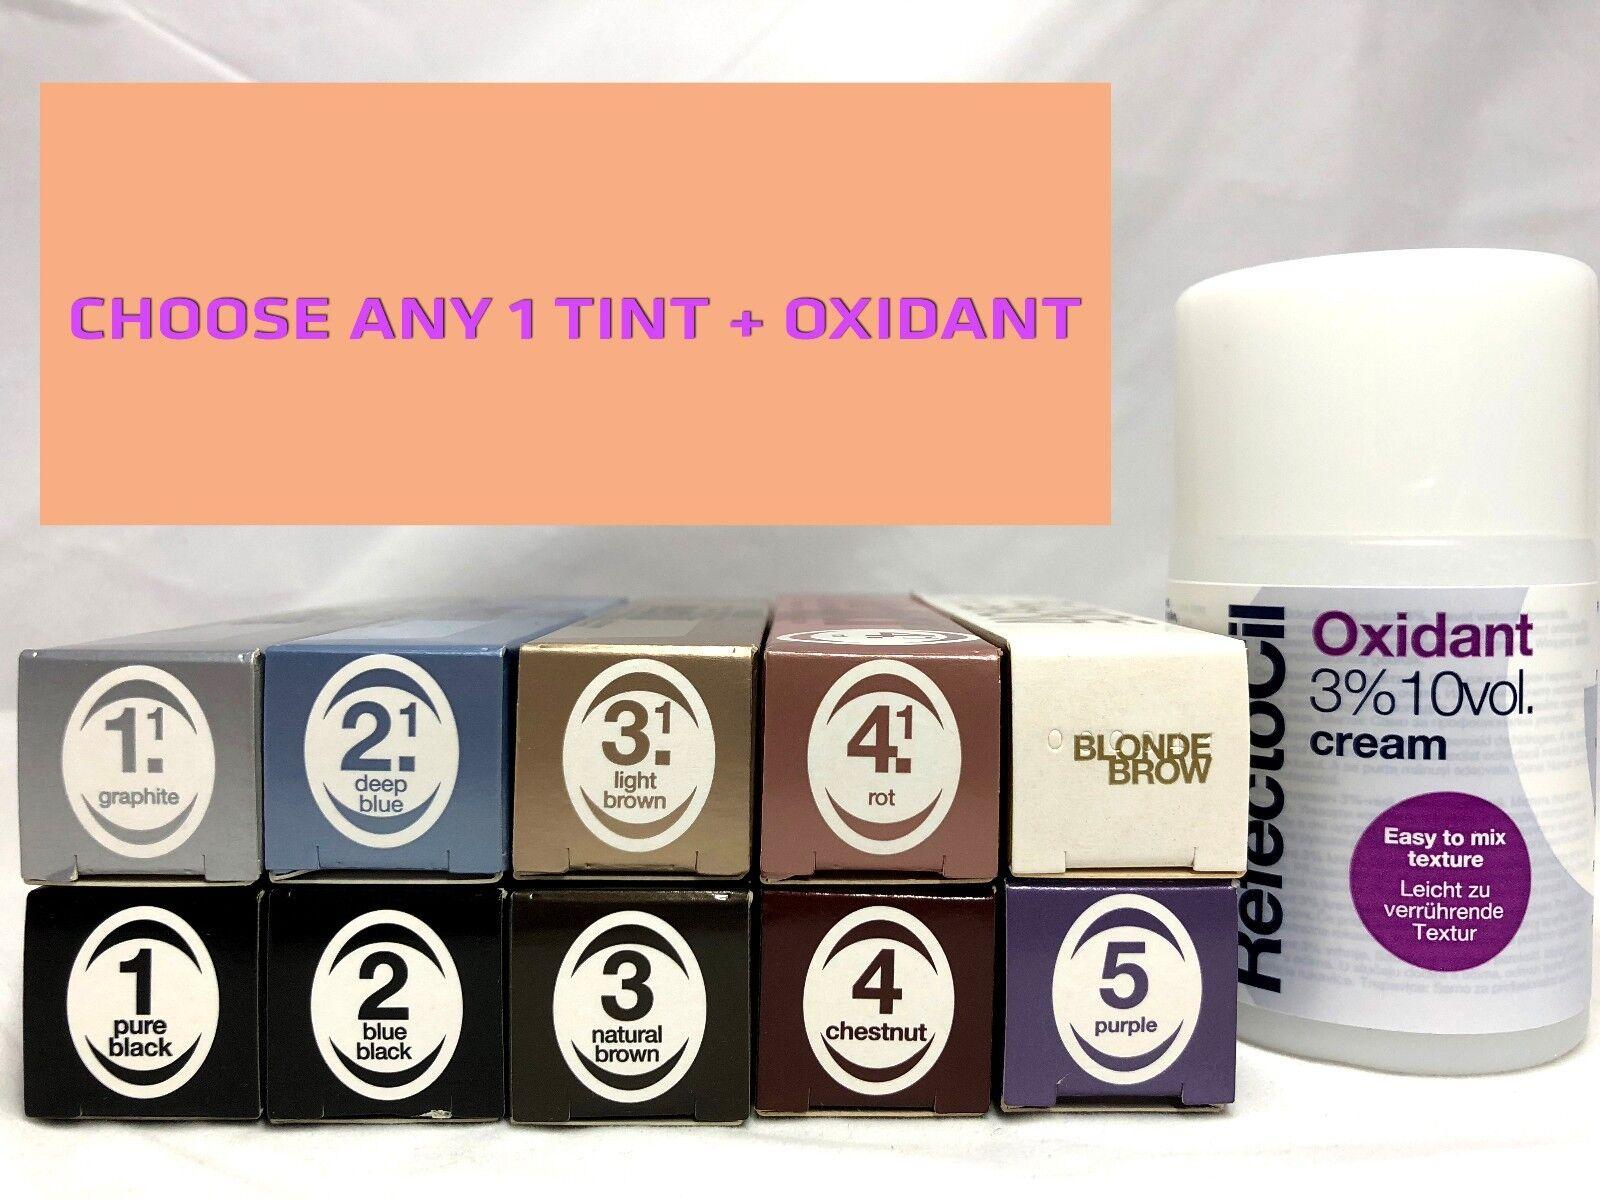 Refectocil Tint Eyelash Lash Eyebrow Brow Tinting Colour Oxidant